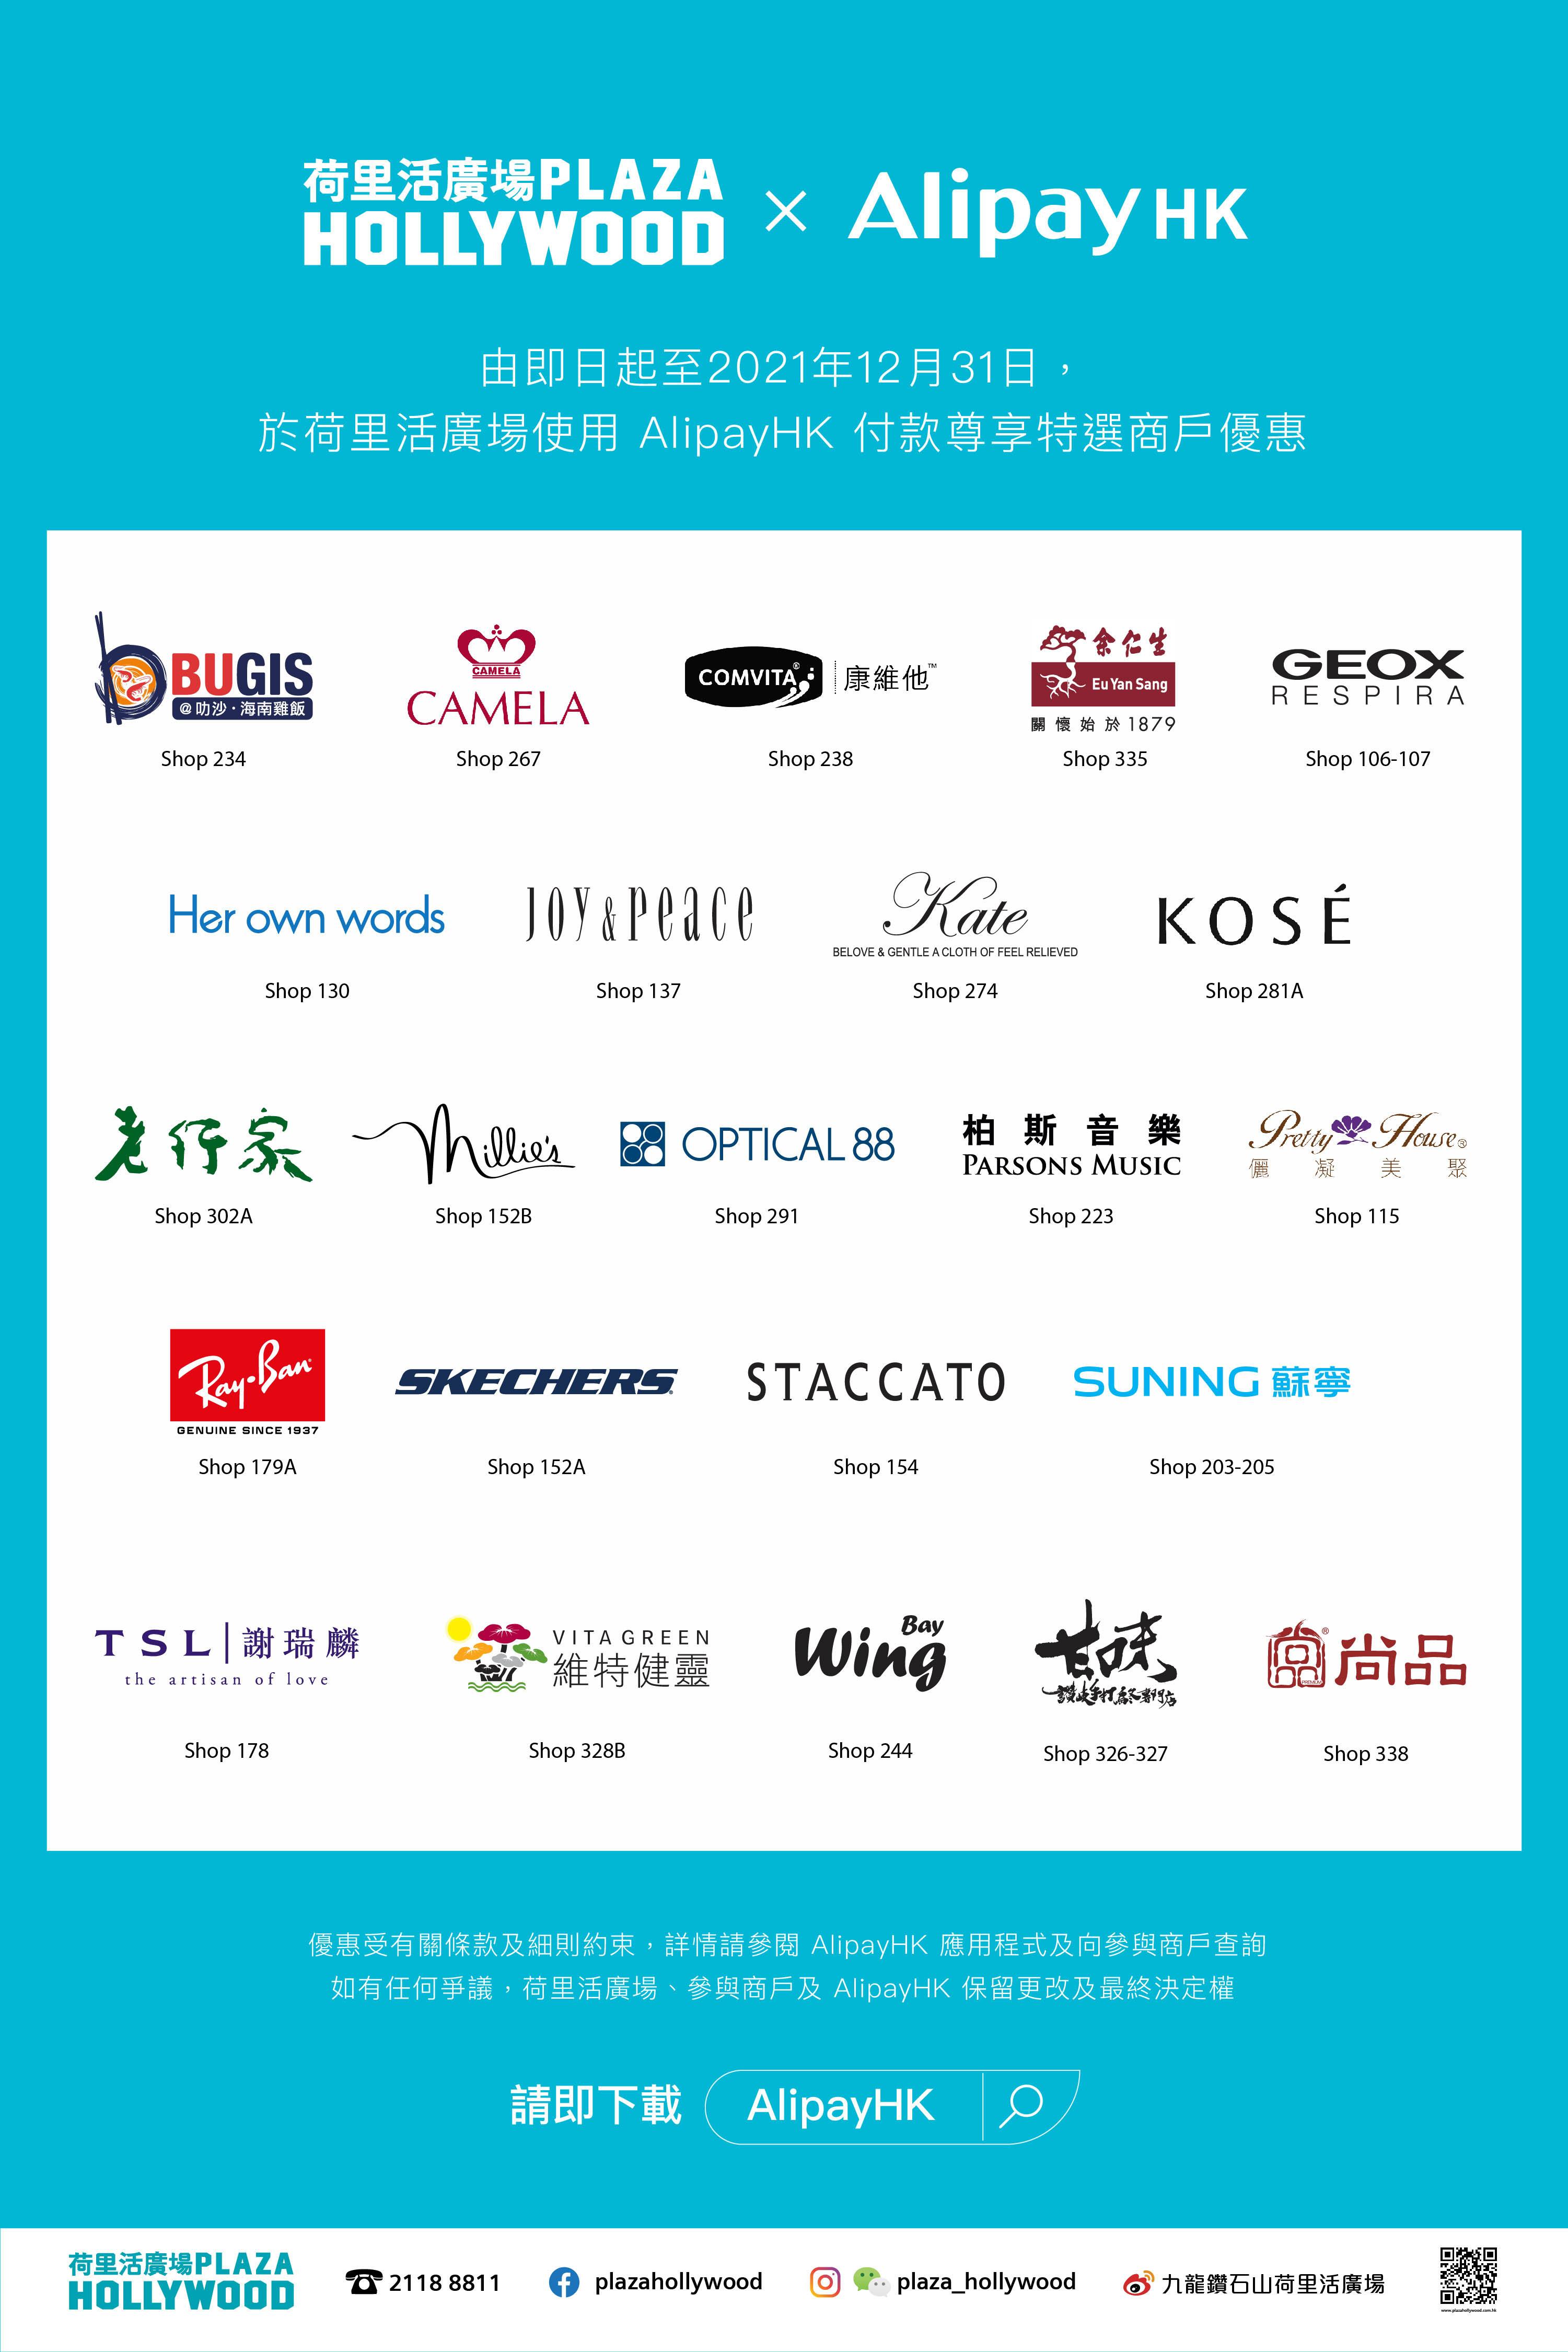 AlipayHK Shopping Privileges Promotion